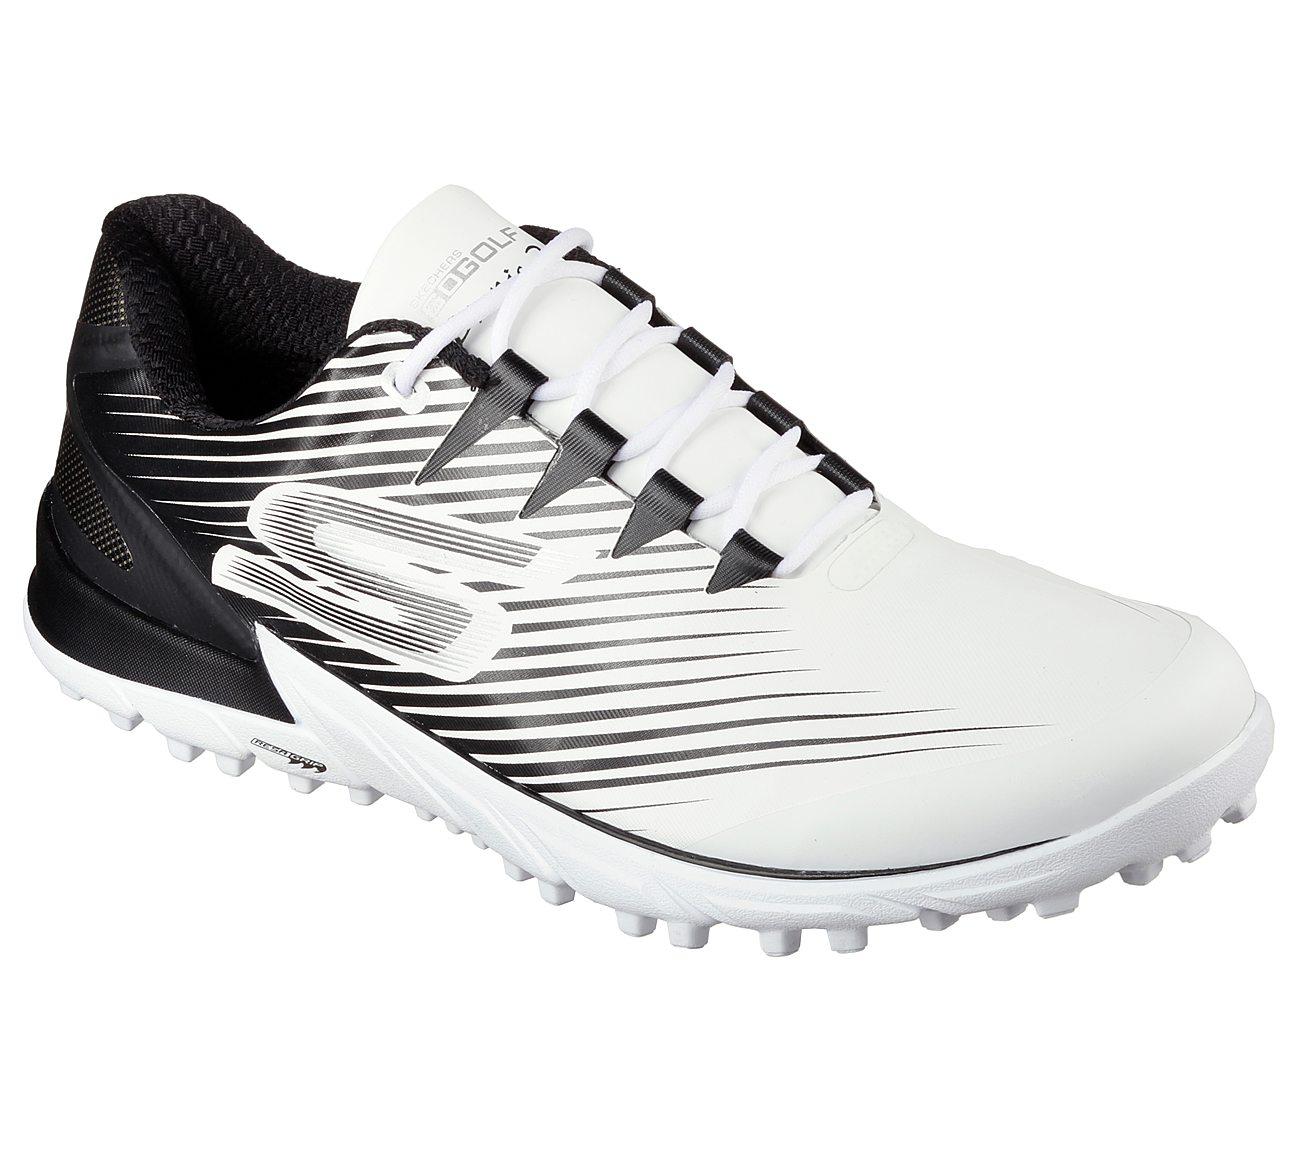 1fa53b6f3731 Buy SKECHERS Skechers GO GOLF Bionic 2 Skechers Performance Shoes ...